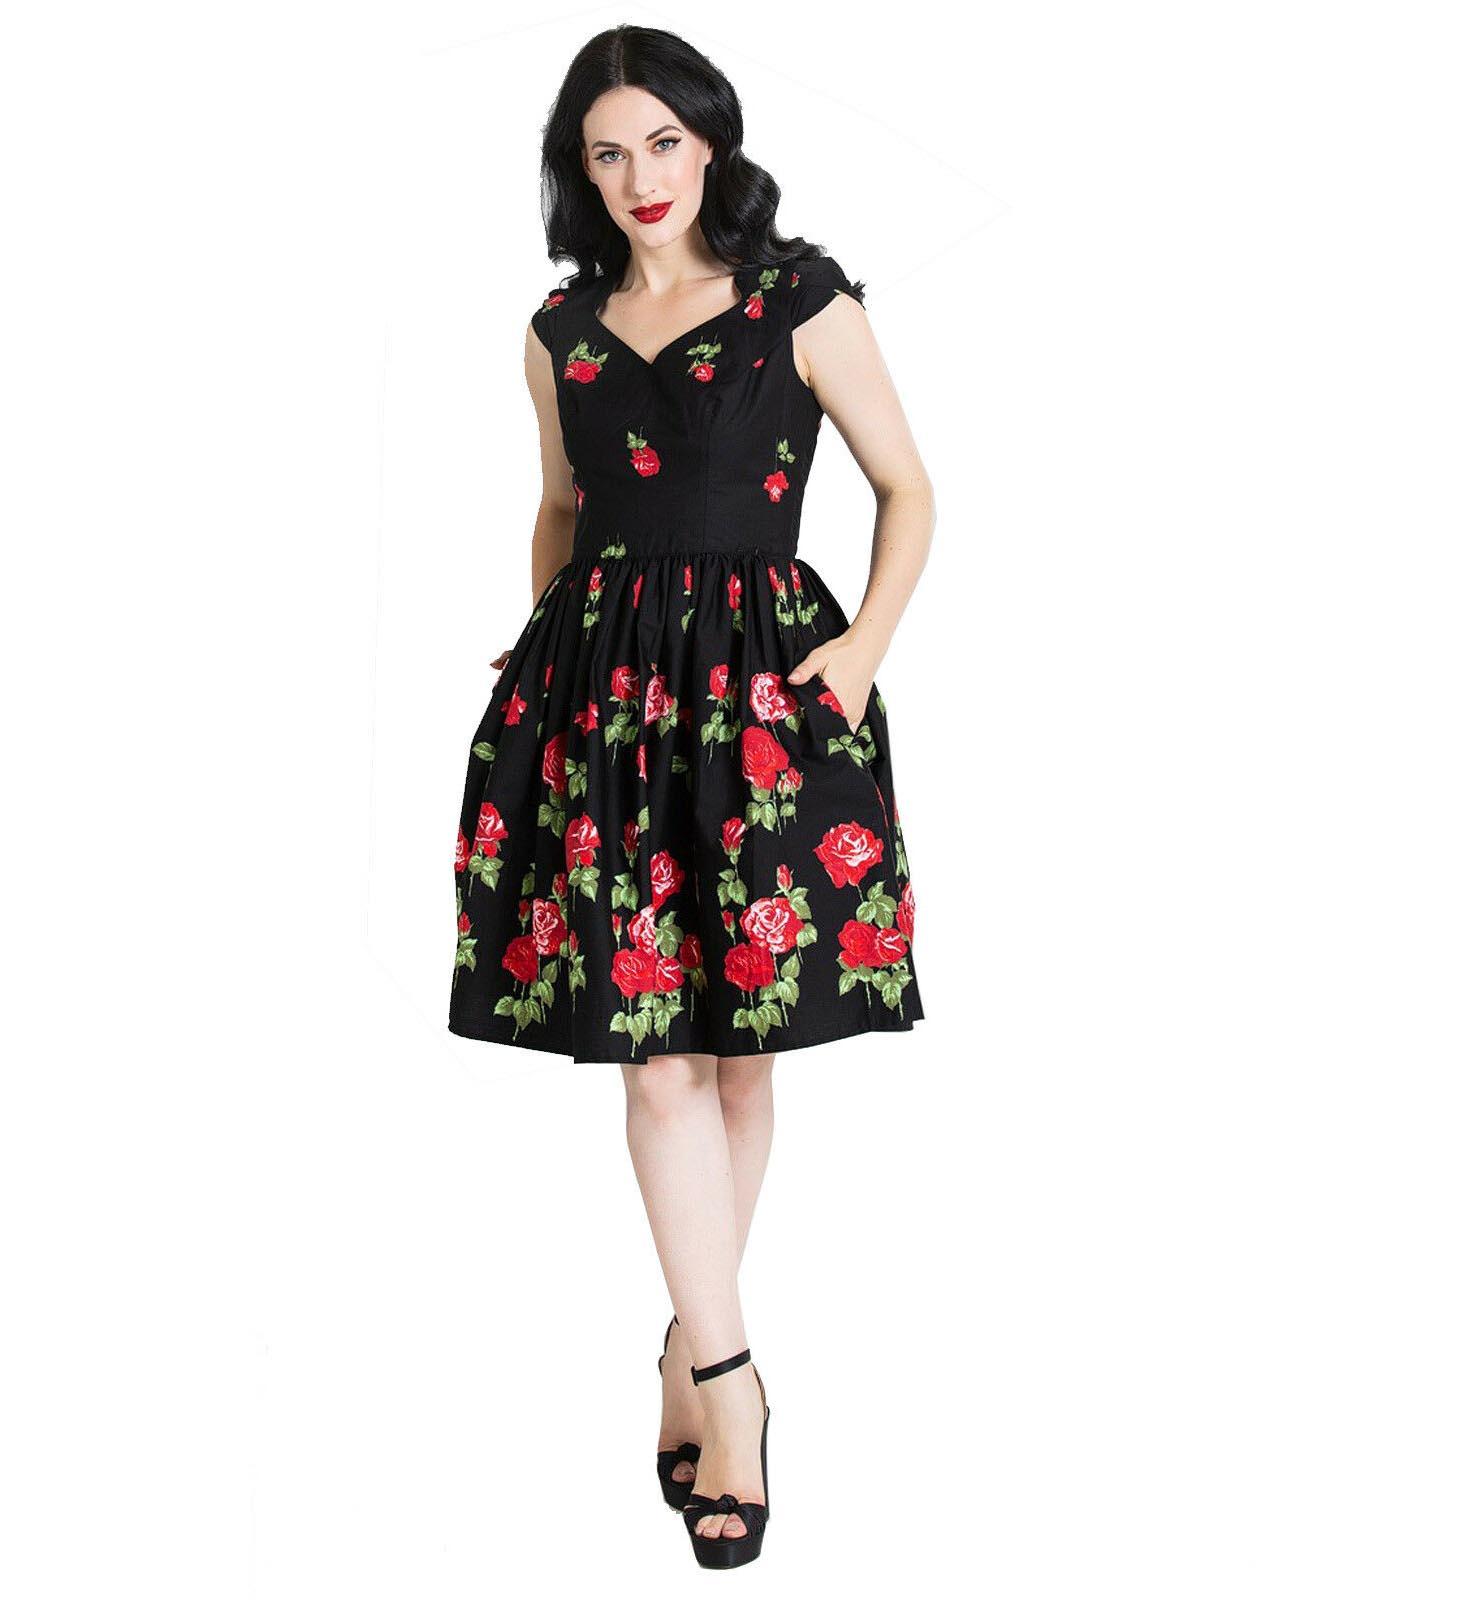 Hell-Bunny-Pin-Up-Mid-Length-50s-Dress-ANTONIA-Rose-Floral-Black thumbnail 7